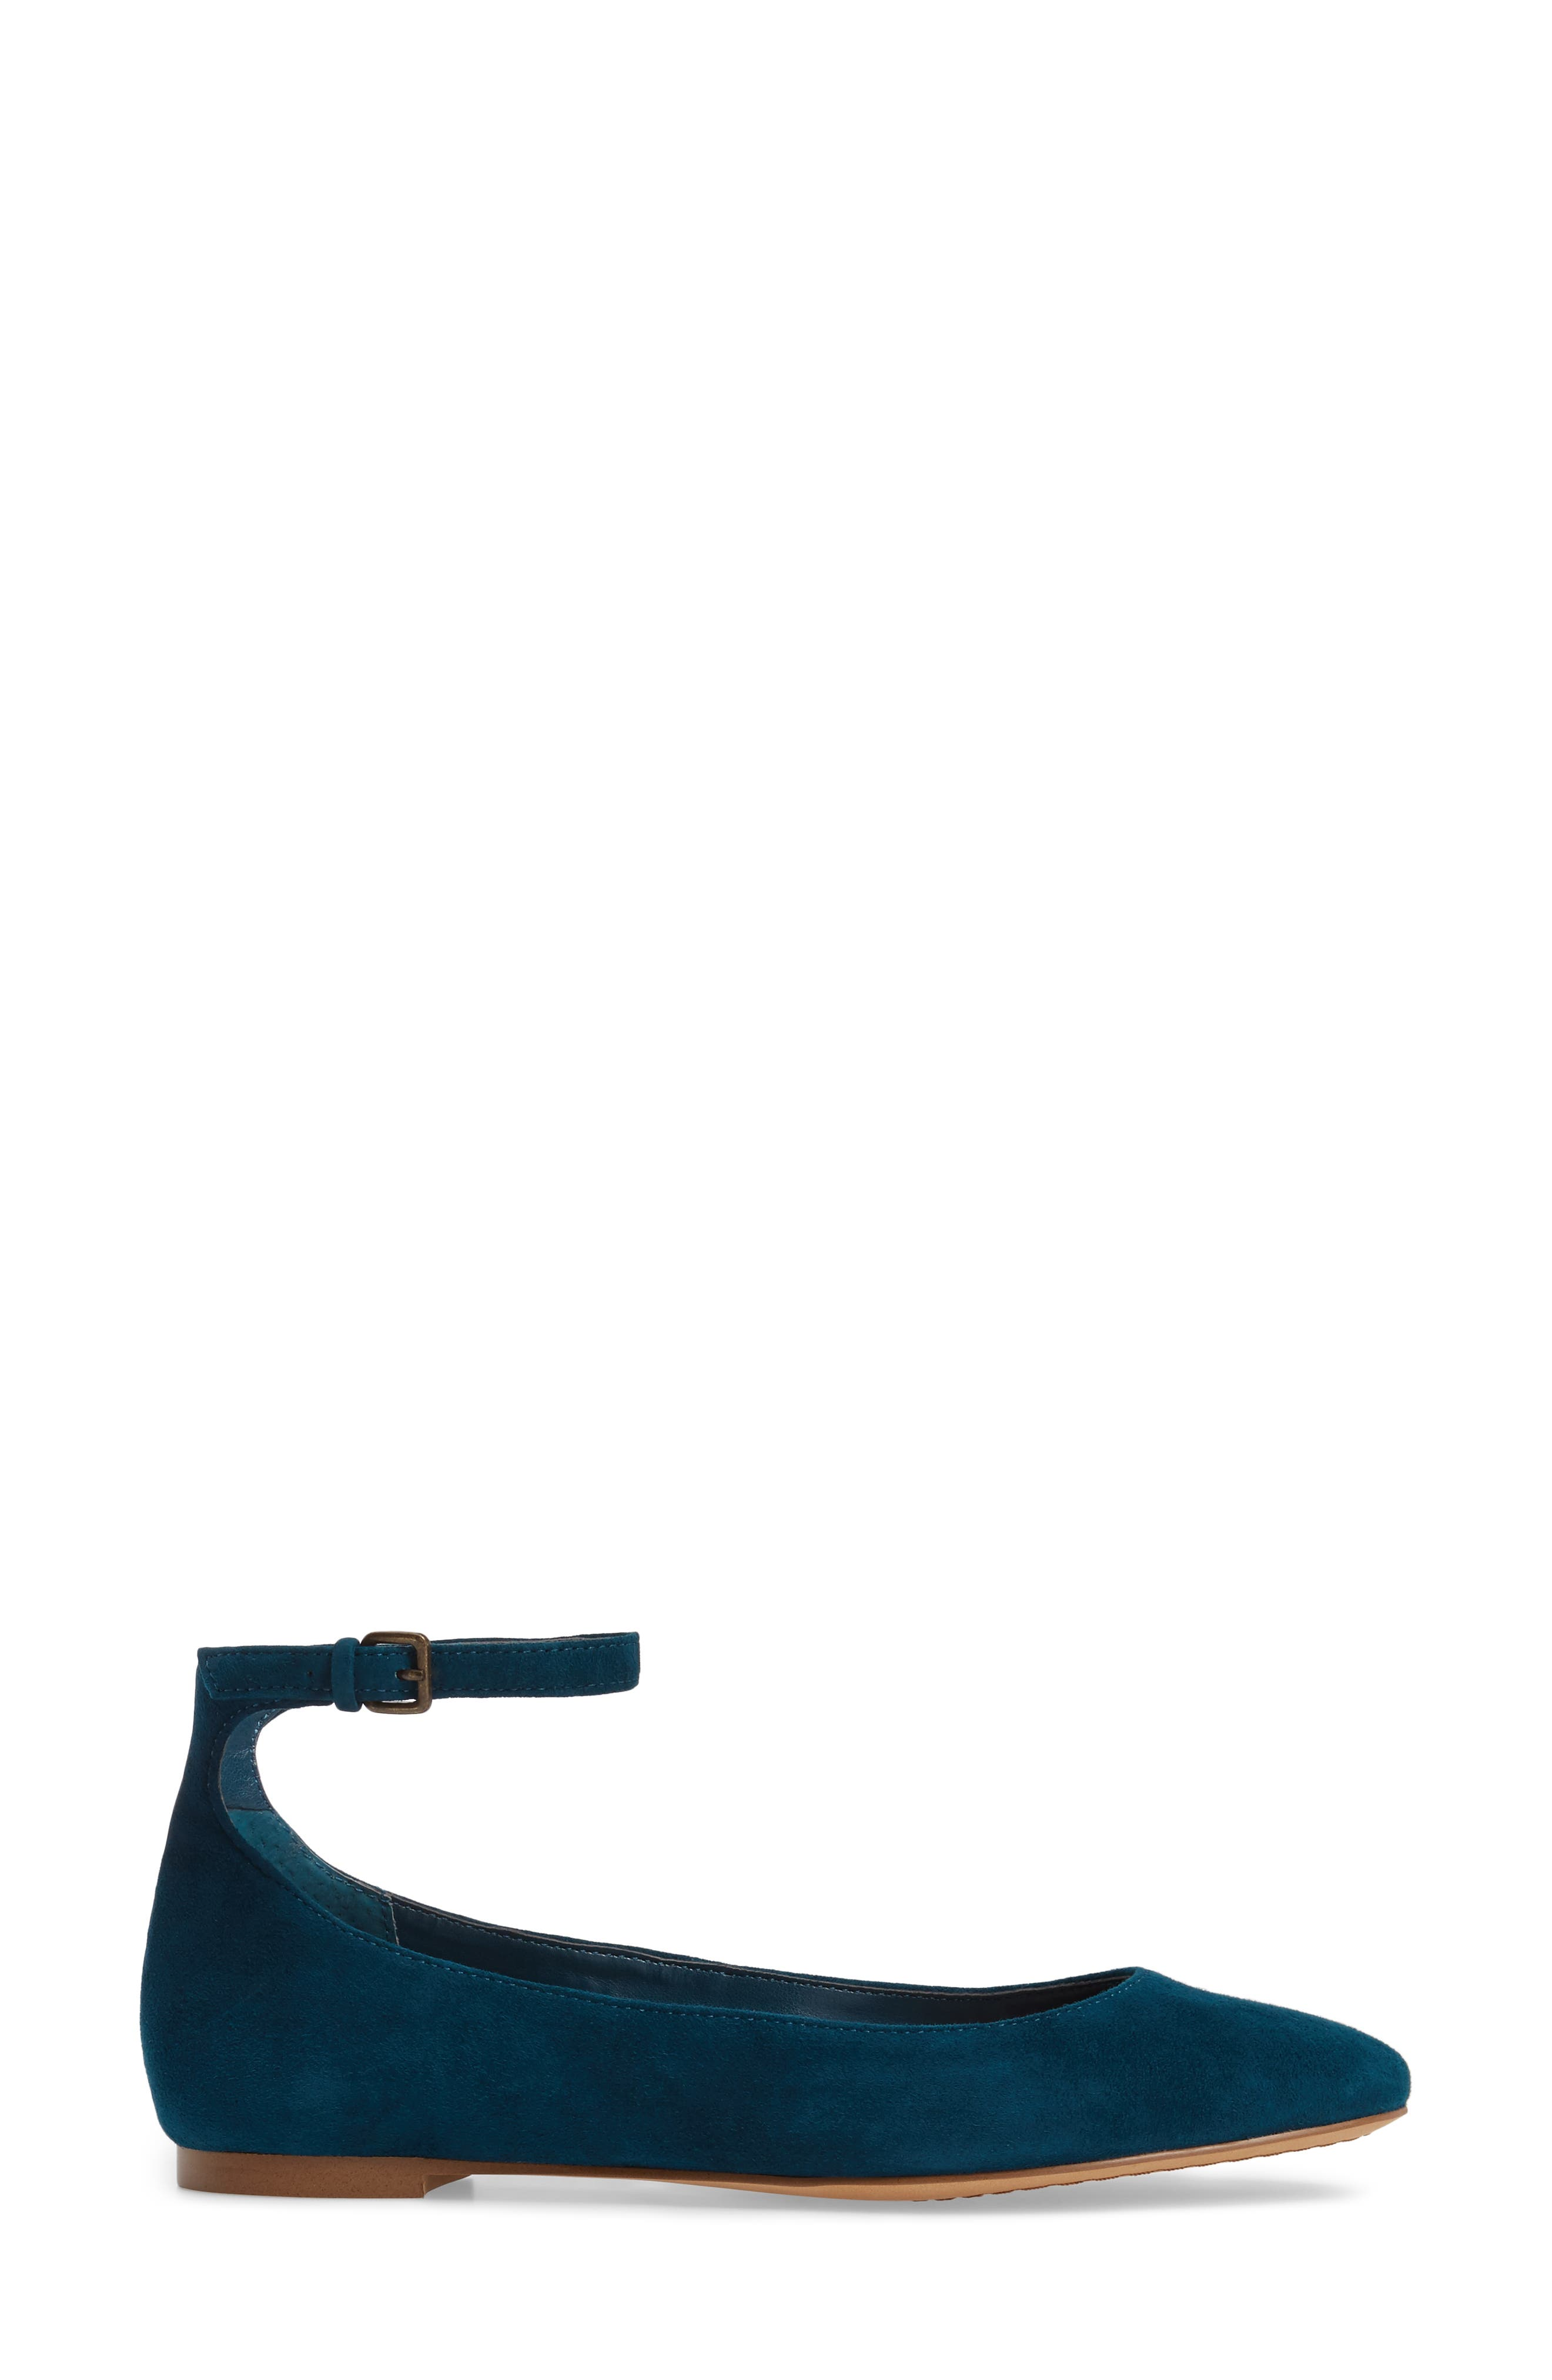 Alternate Image 3  - Treasure & Bond Jules Ankle Strap Ballet Flat (Women)